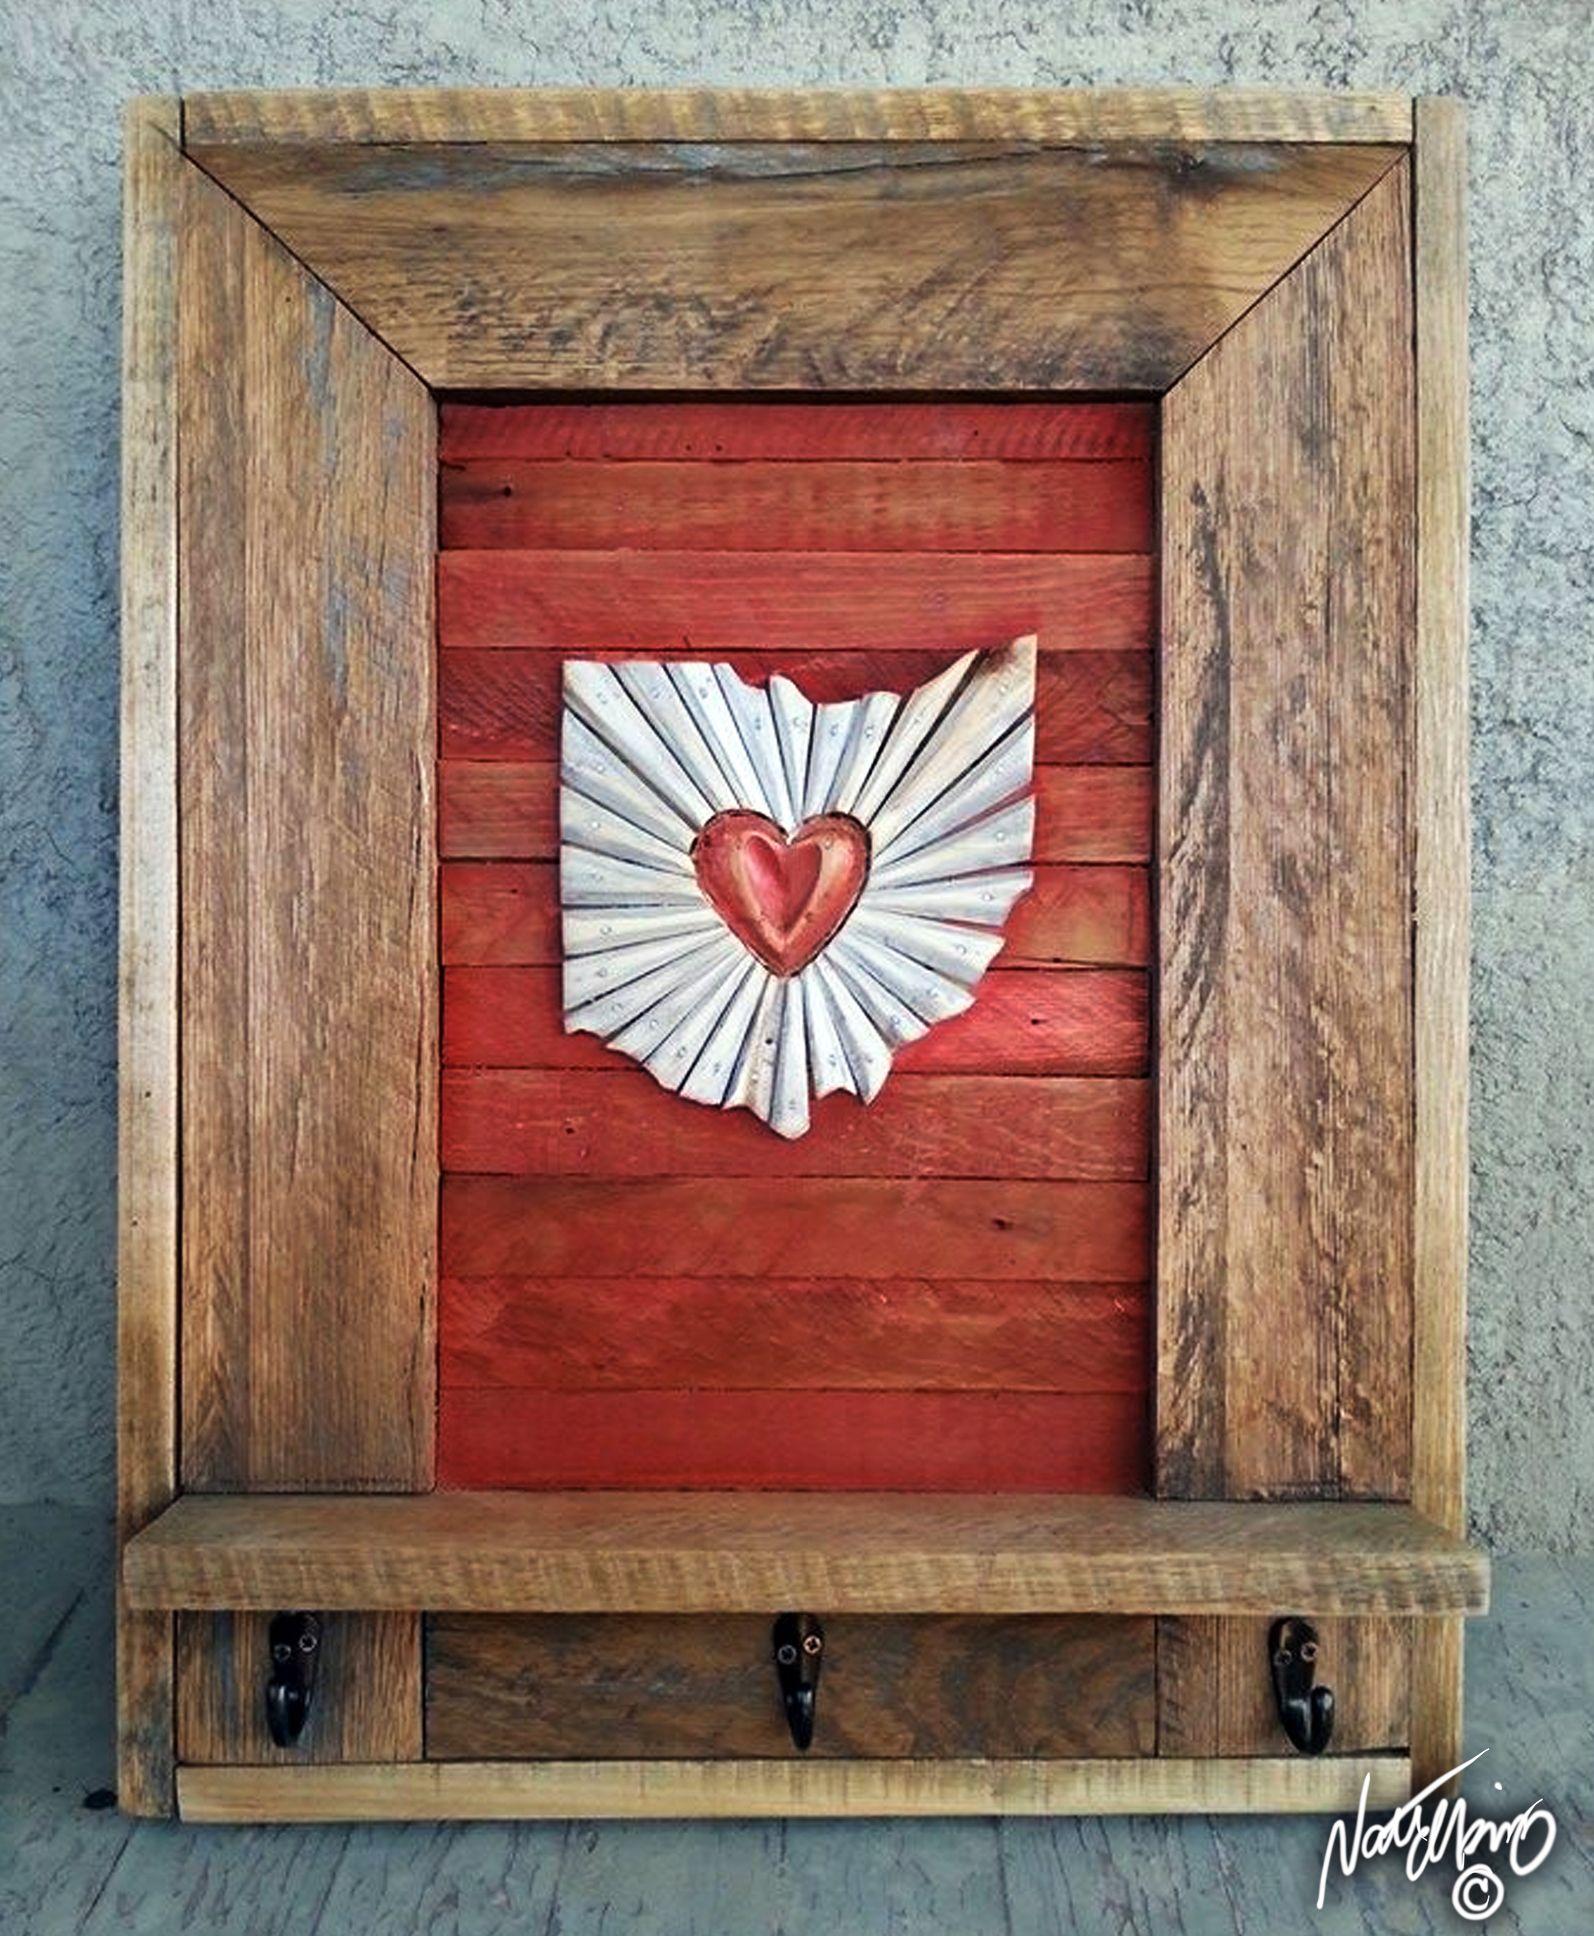 Ohio Wall Art neideas on facebook! original artnate elkins,buckeye,hand